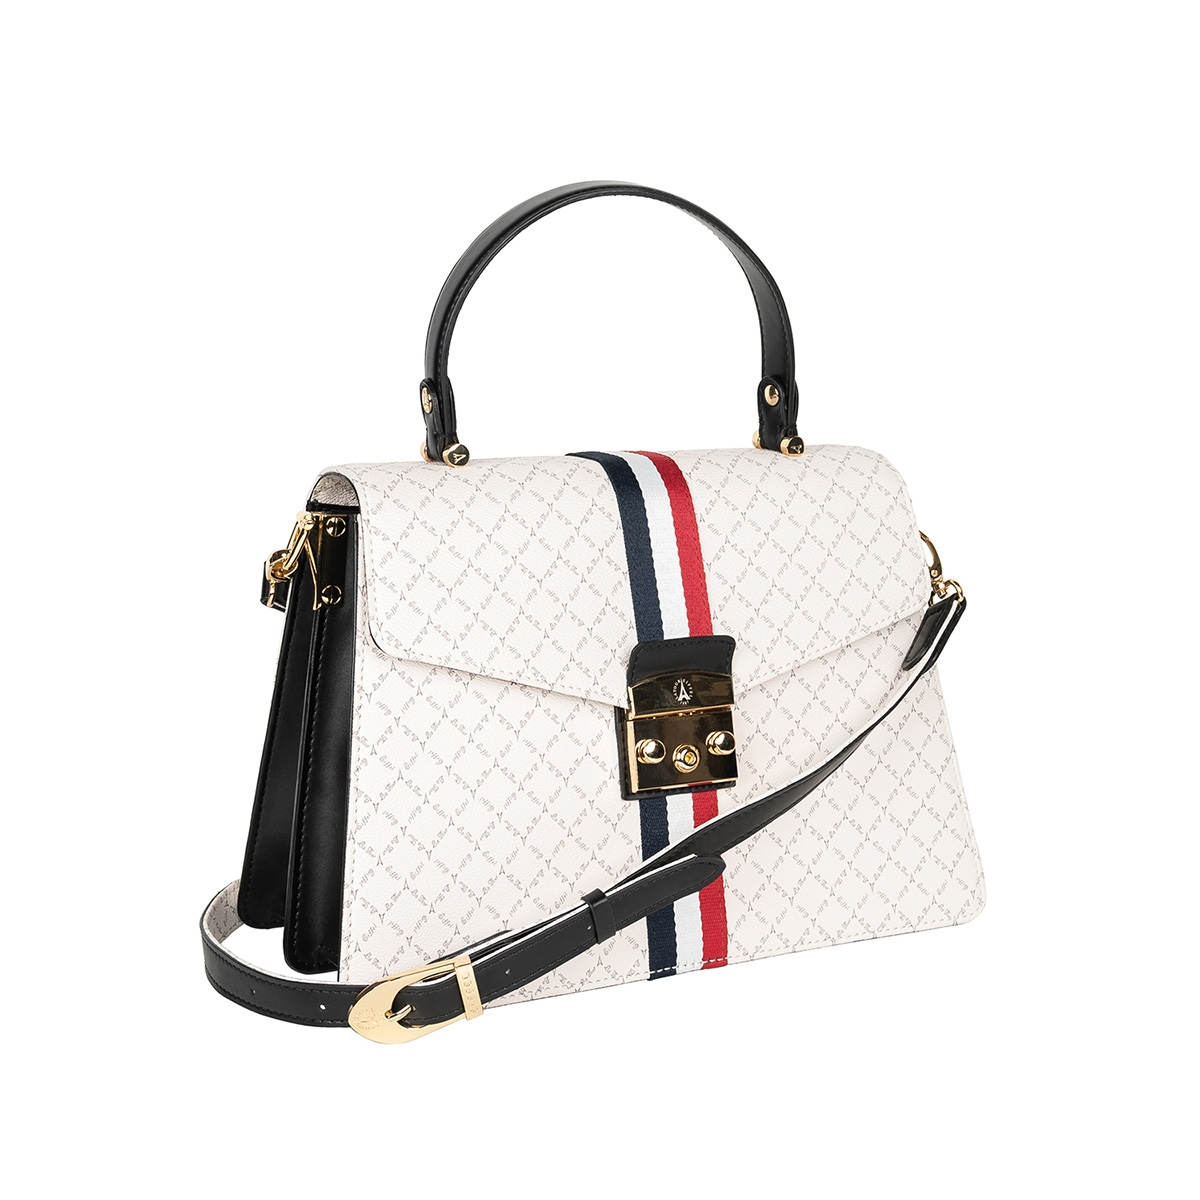 378b85e75b Τσάντα Ώμου-Χειρός Με Ρίγα La Tour Eiffel Logo-Δέρμα 171033 Λευκή ...